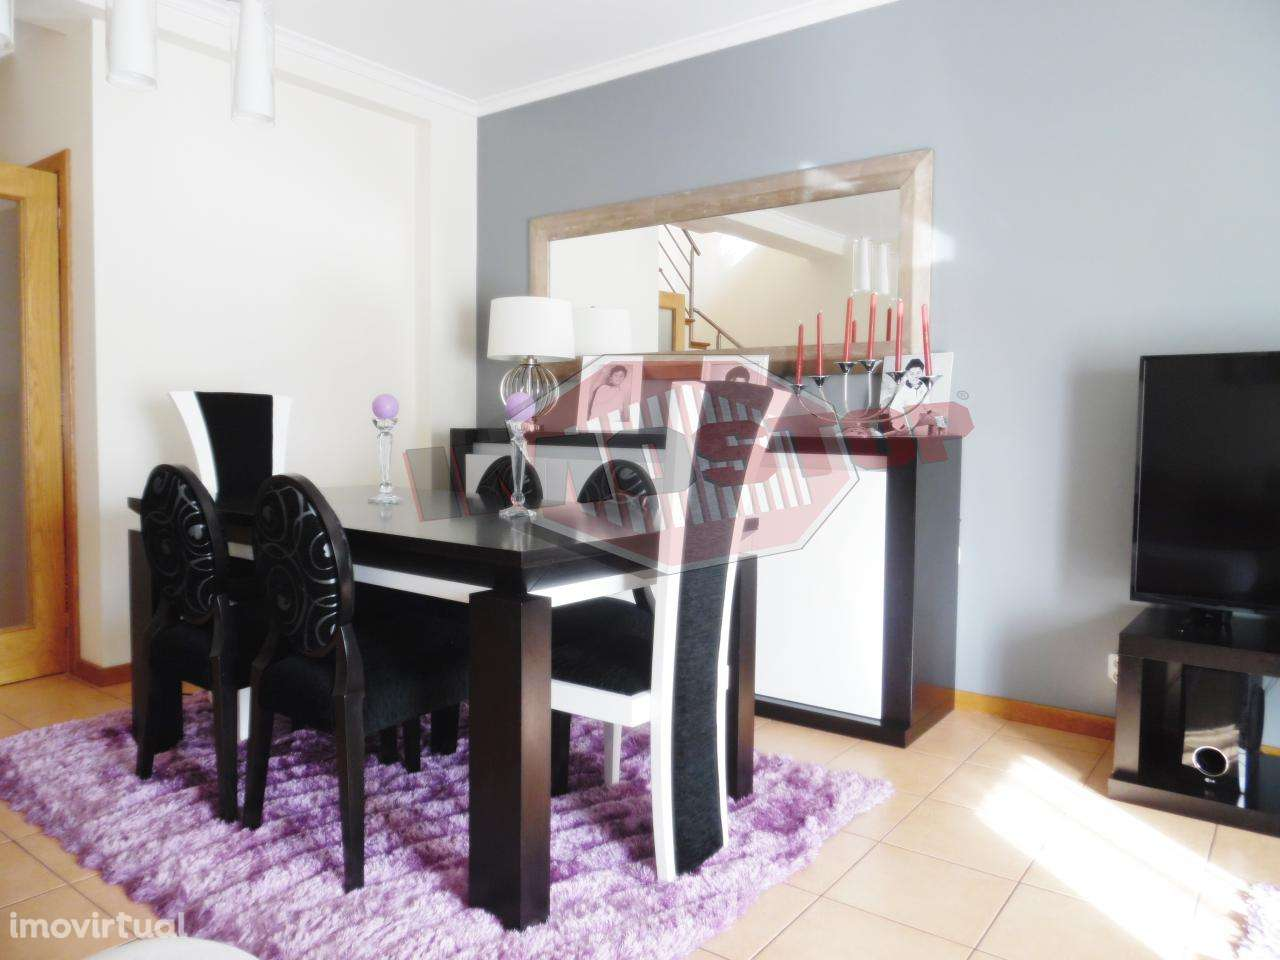 Apartamento para comprar, Oiã, Oliveira do Bairro, Aveiro - Foto 4